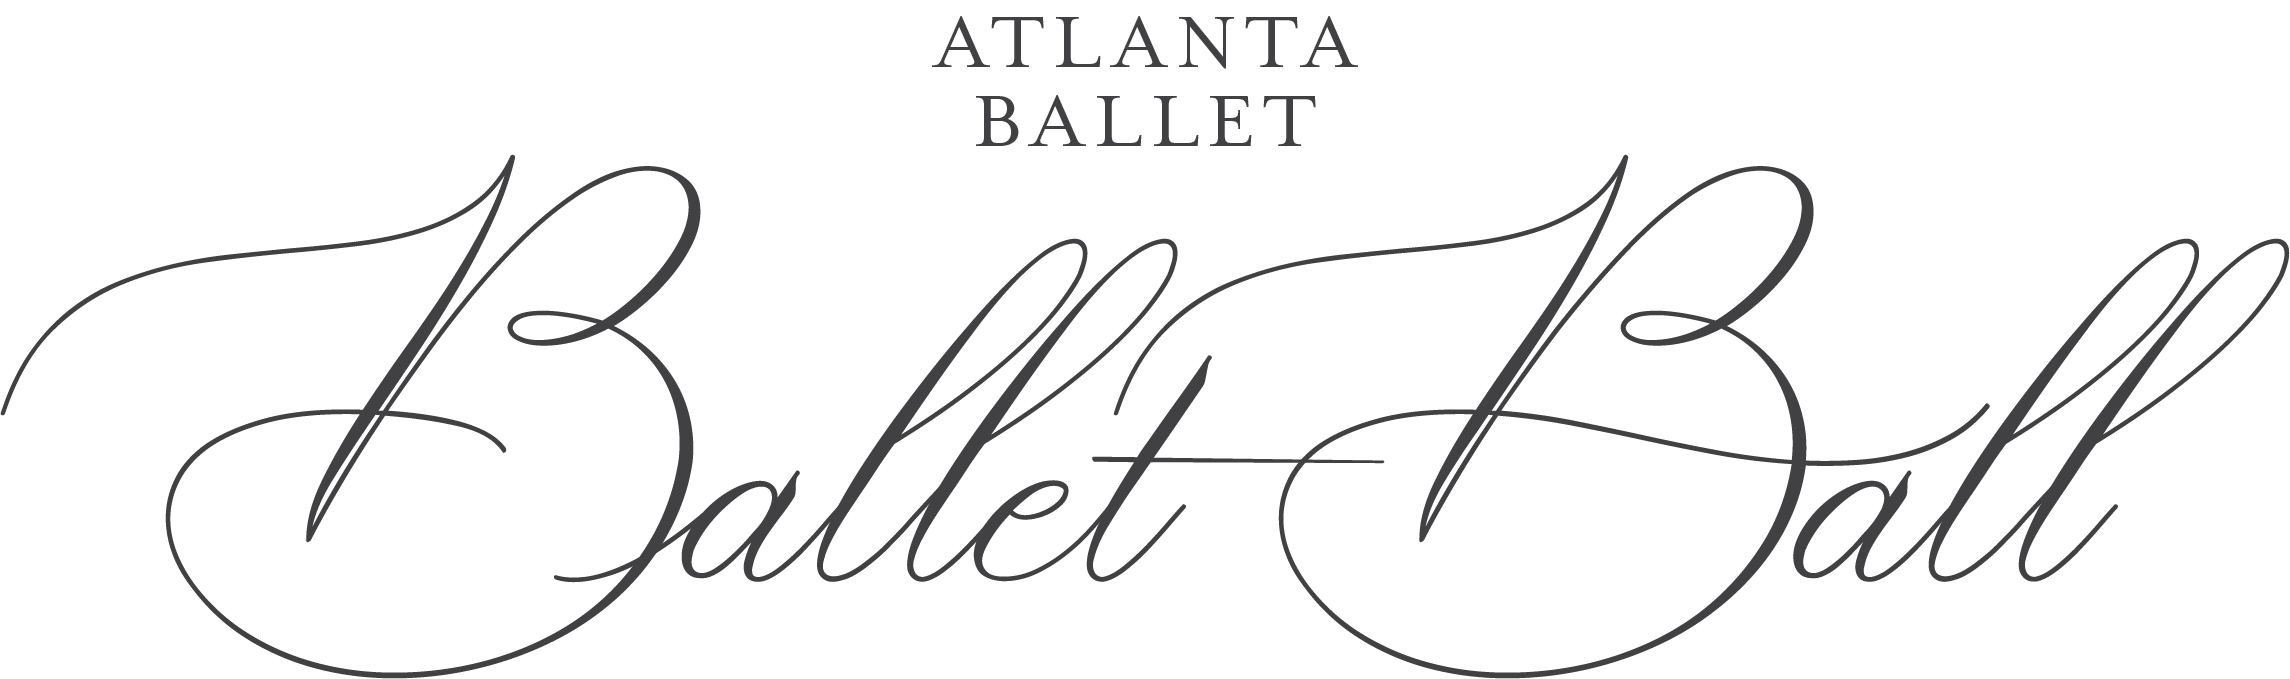 2020_BalletBall_Logo_dark-grey_no-date_RGB.png?mtime=20191206185609#asset:5709